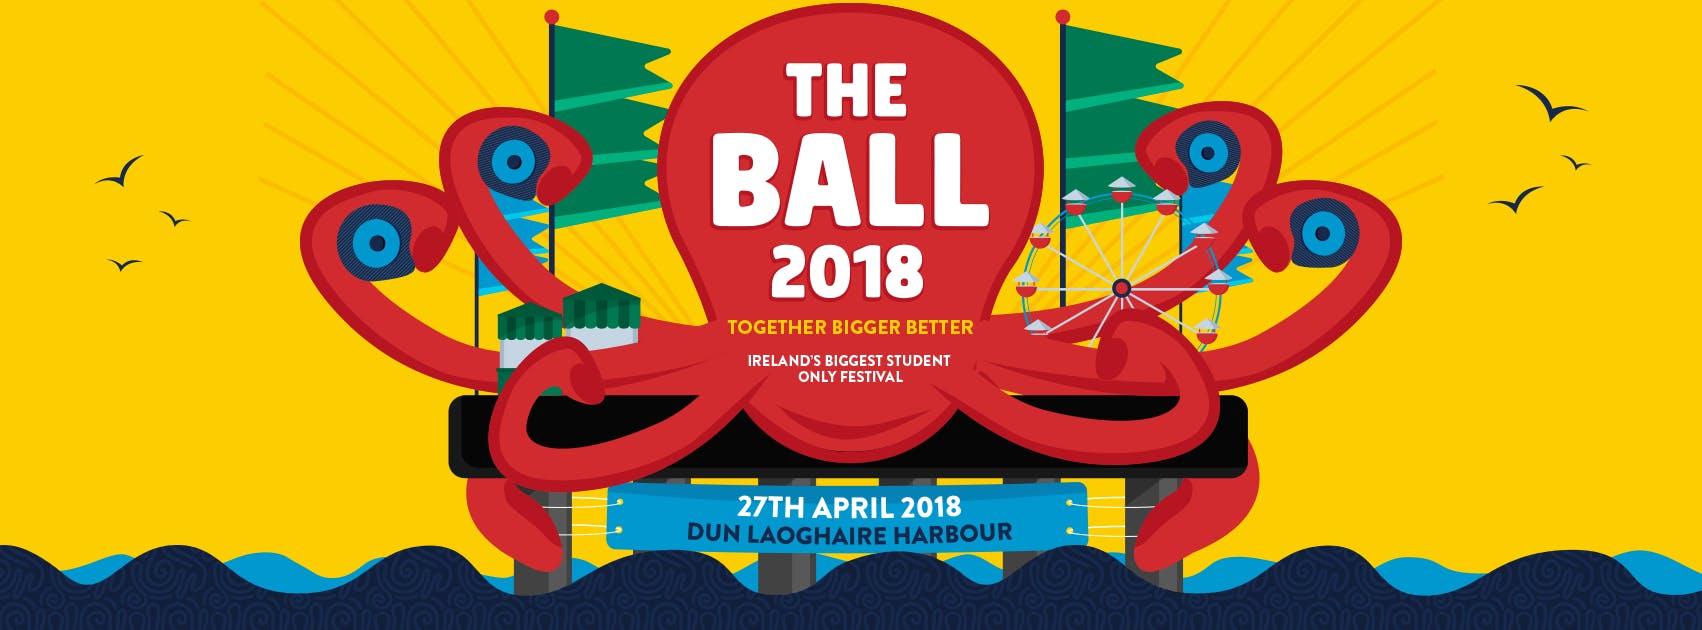 The Ball Festival 2018